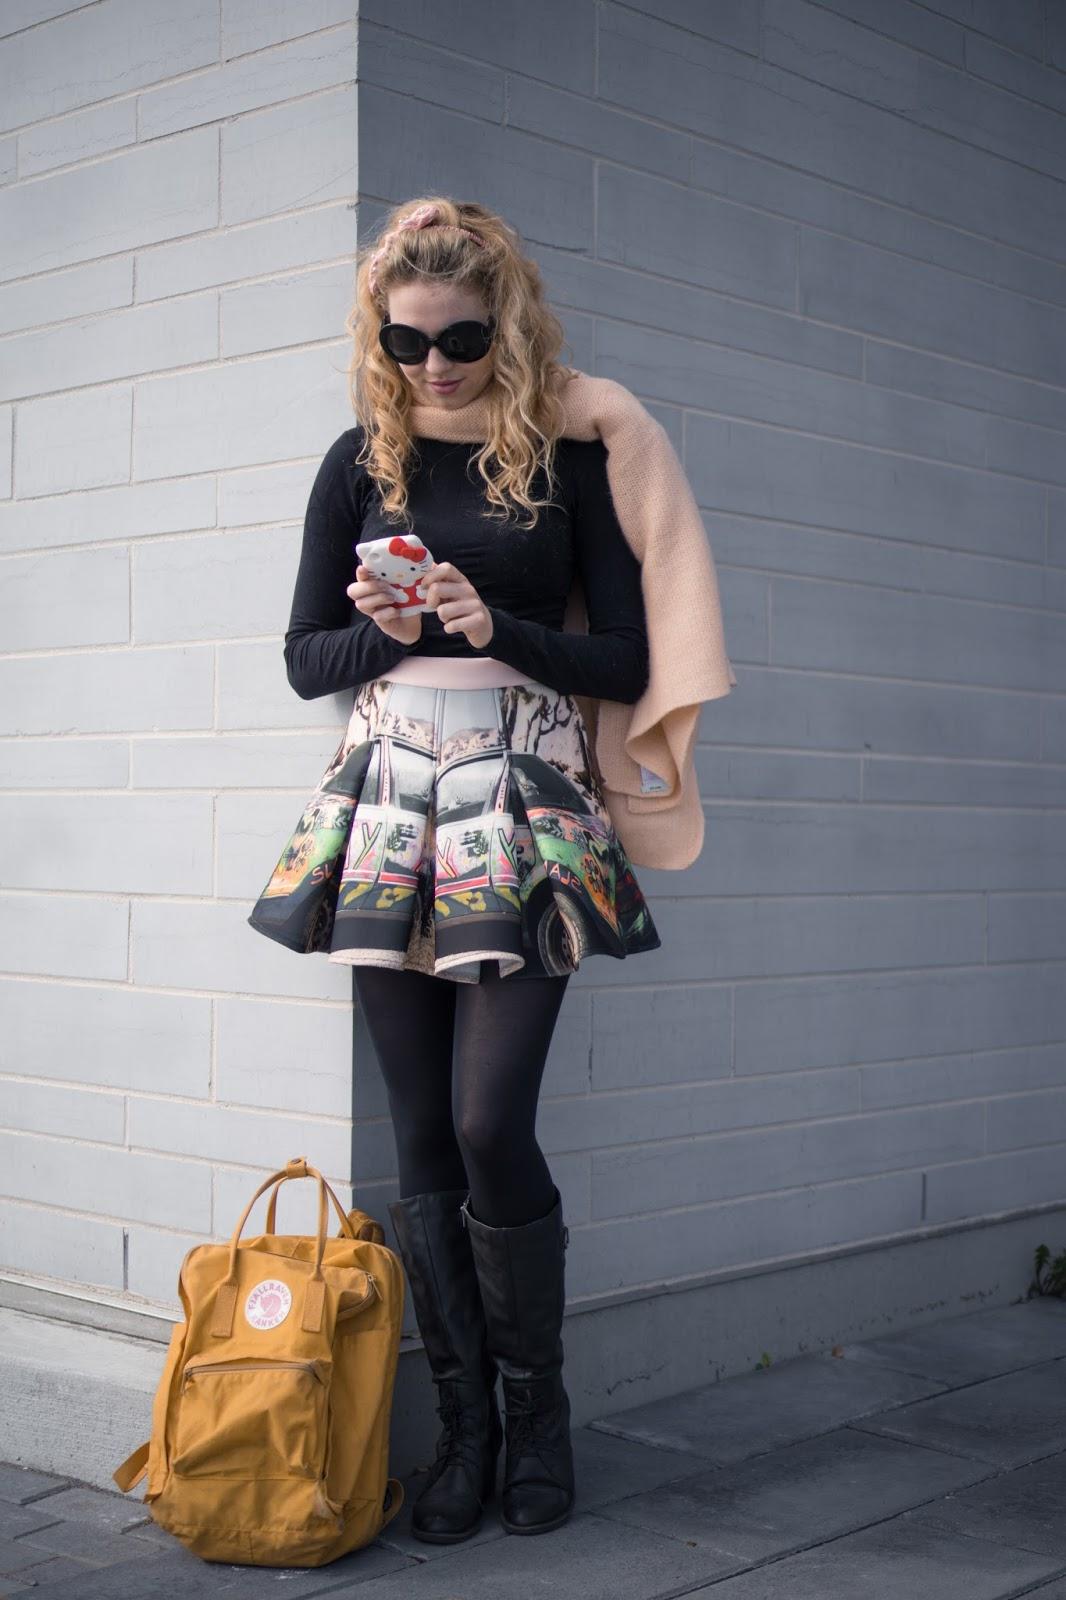 Street Style, Fashion Blogger, Queen's University, Annie Robinson, FABINCBLOG, Hello Kitty, Flamboyant Fashion, Girly Style, Teen Girl, Fashion Blogger Style